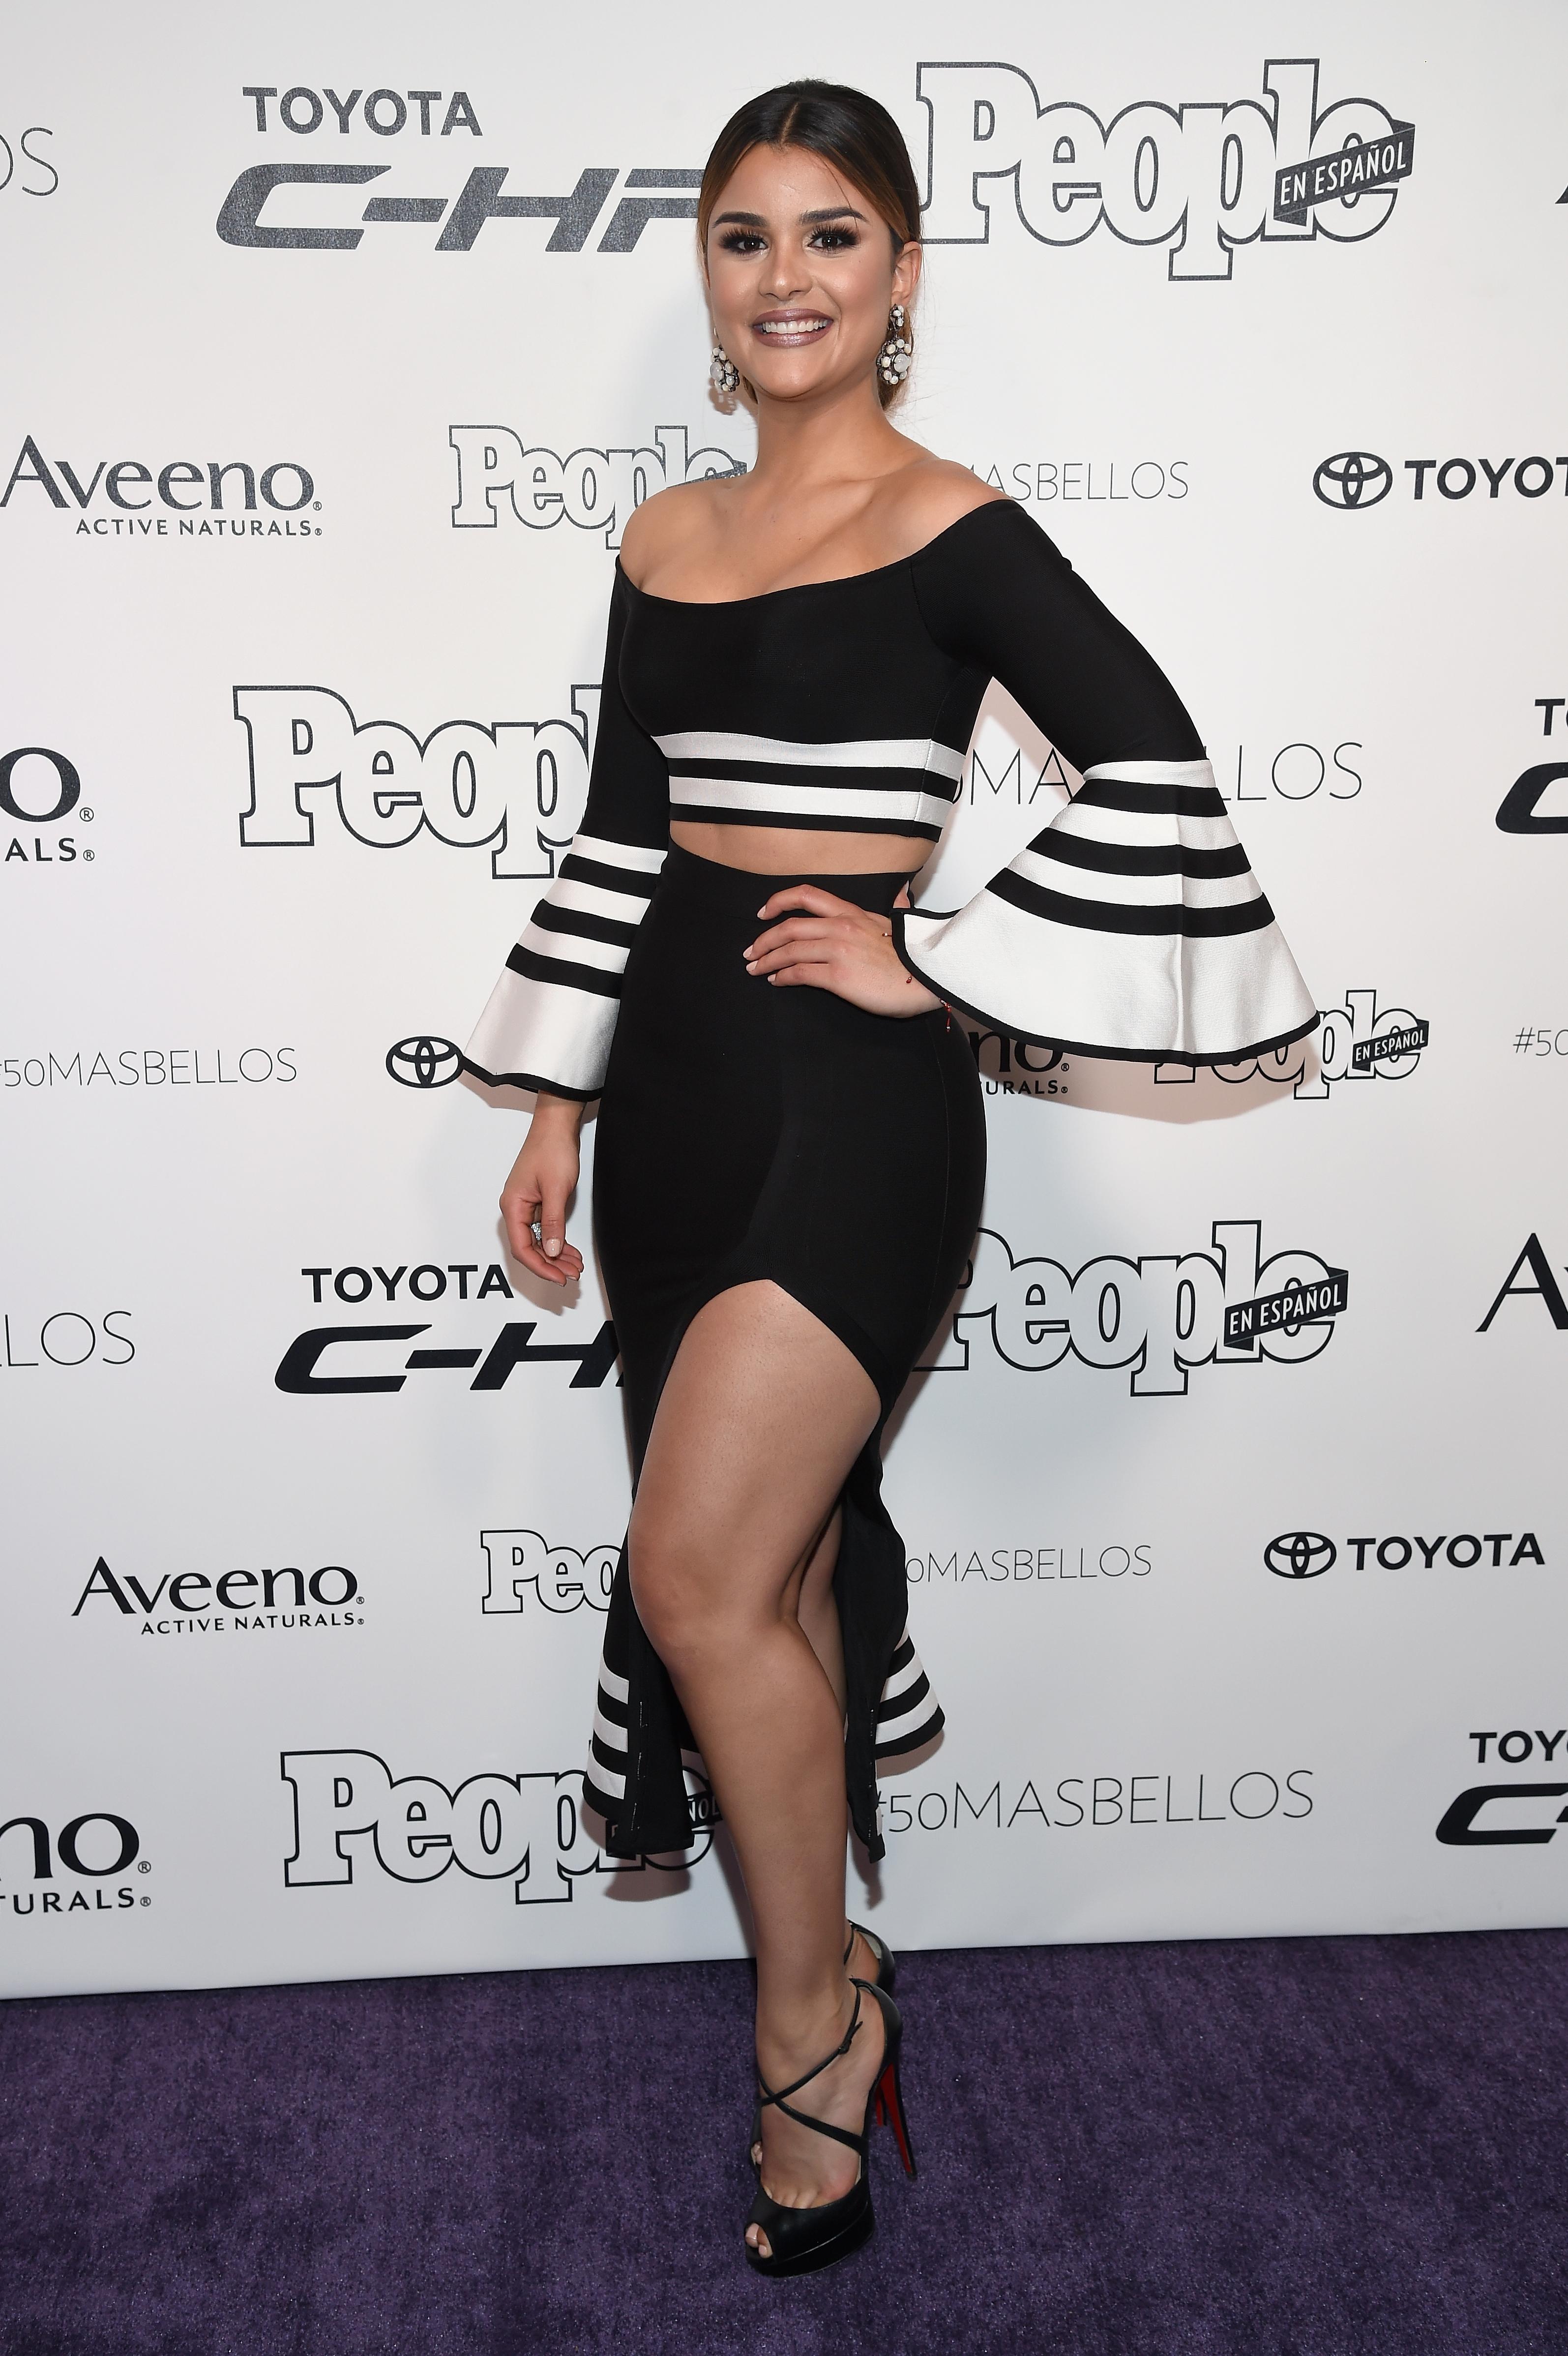 Clarissa Molina, set, conjunto, 50 mas bellos, looks, estilo